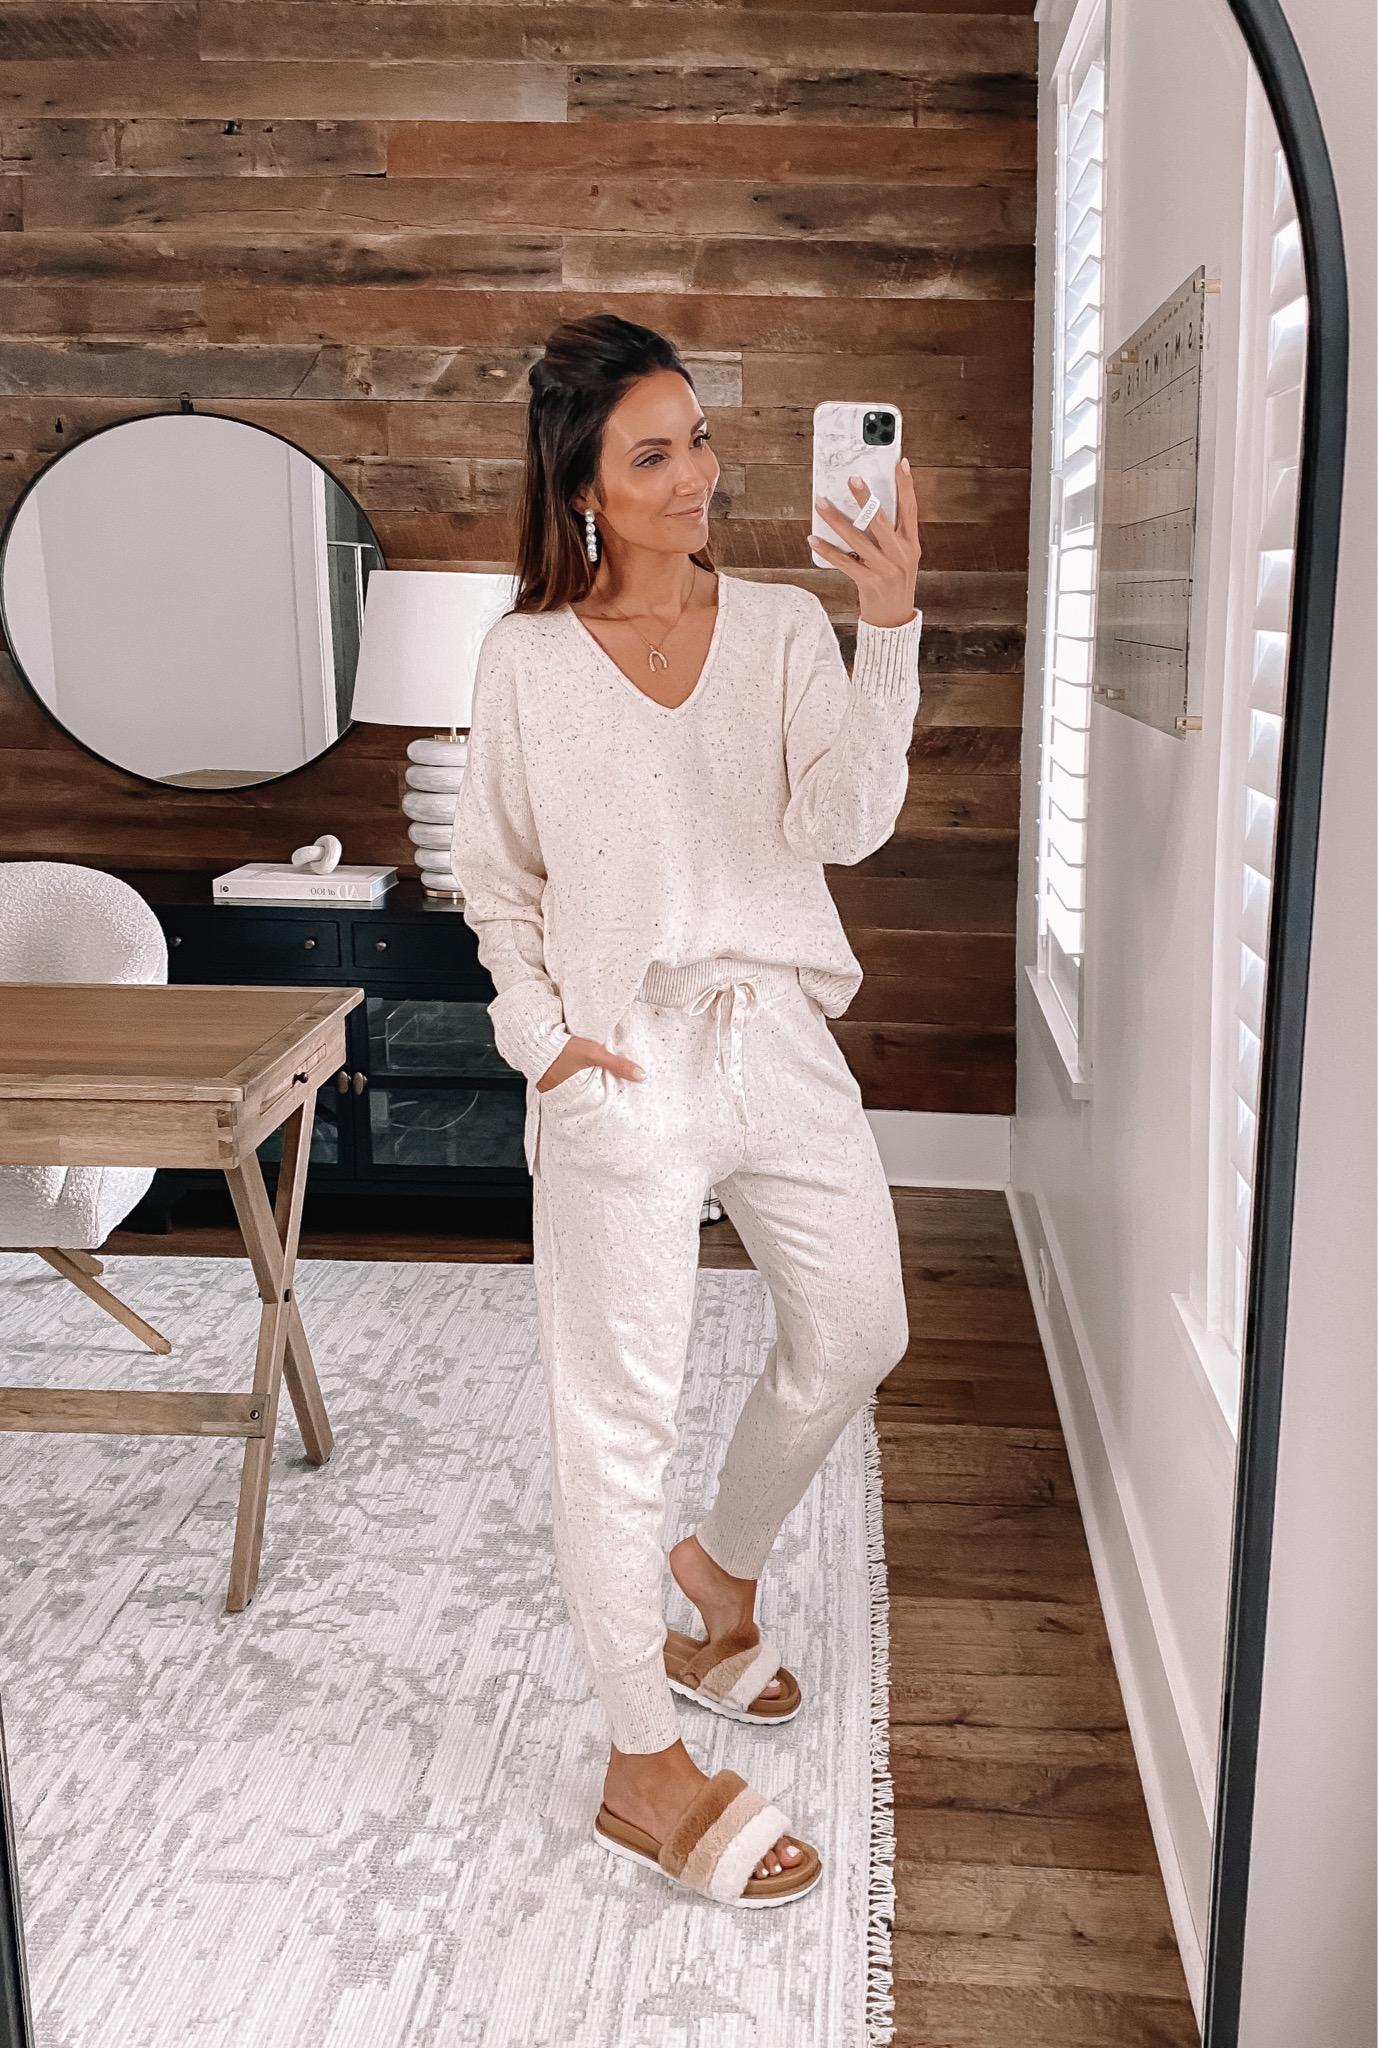 target loungewear, fall style